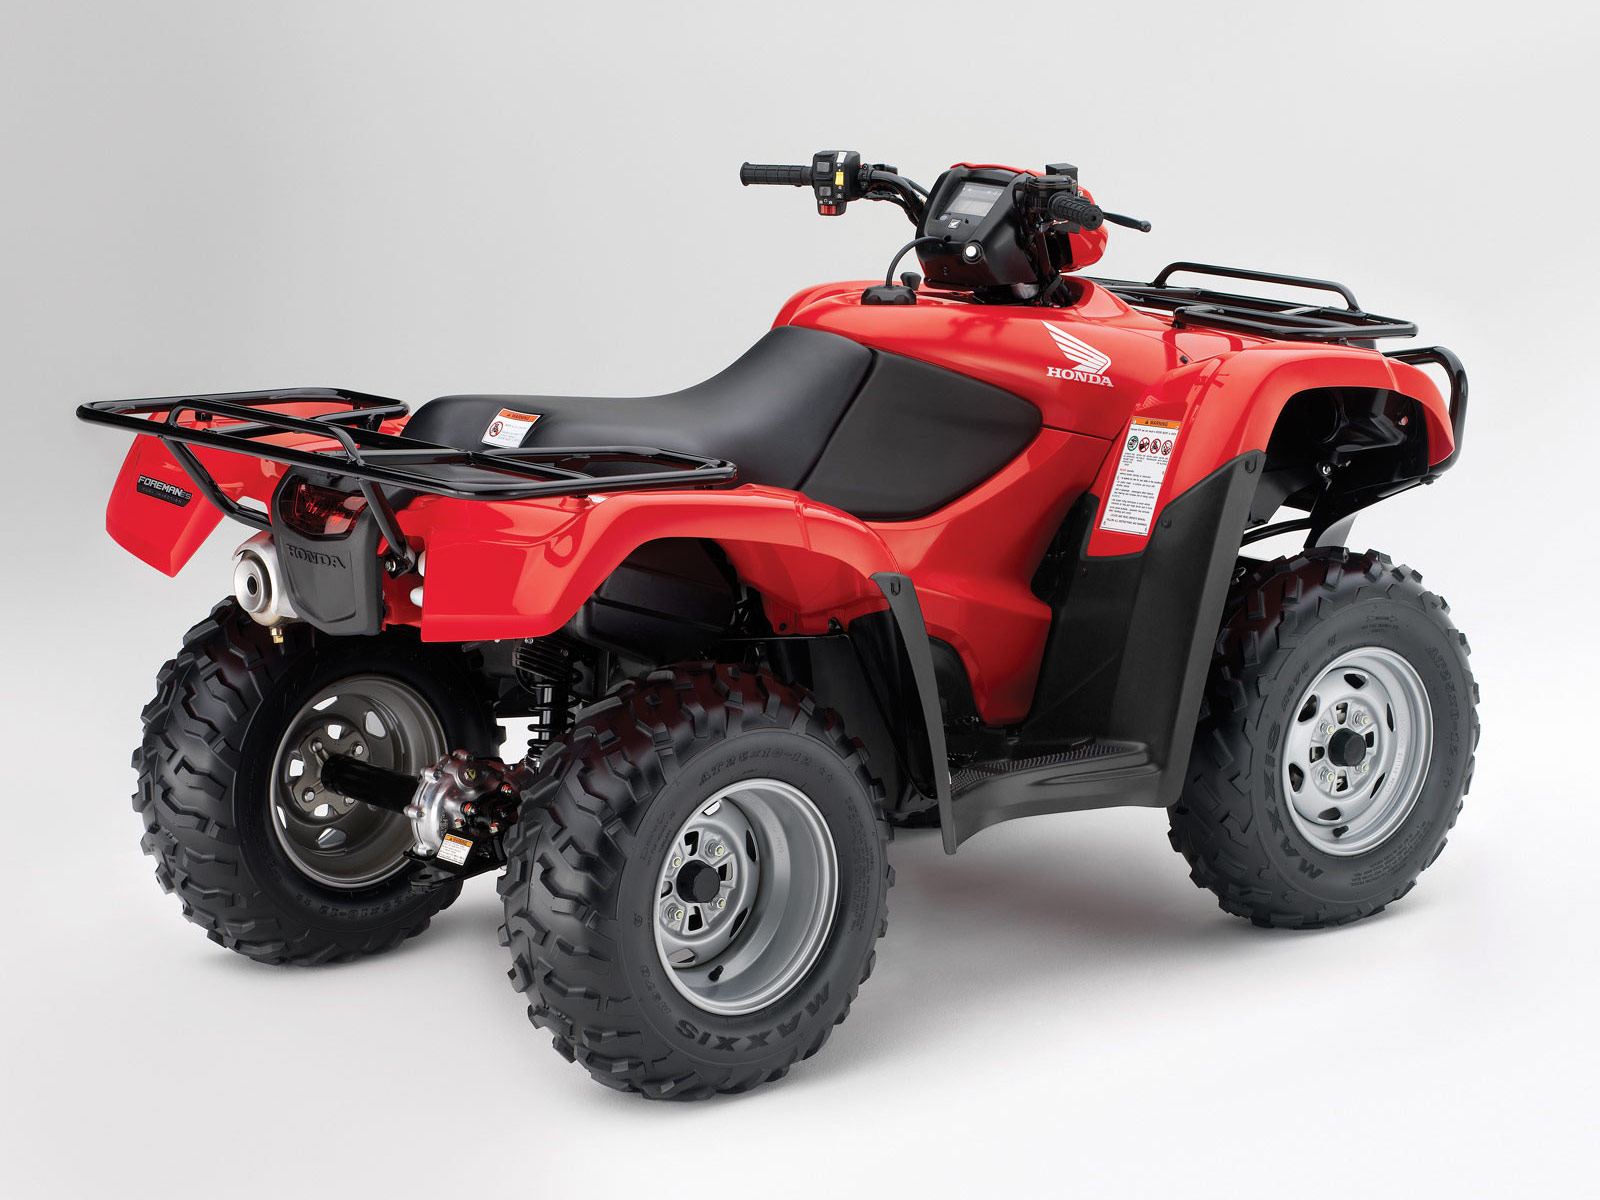 TRX 500 FE 2012